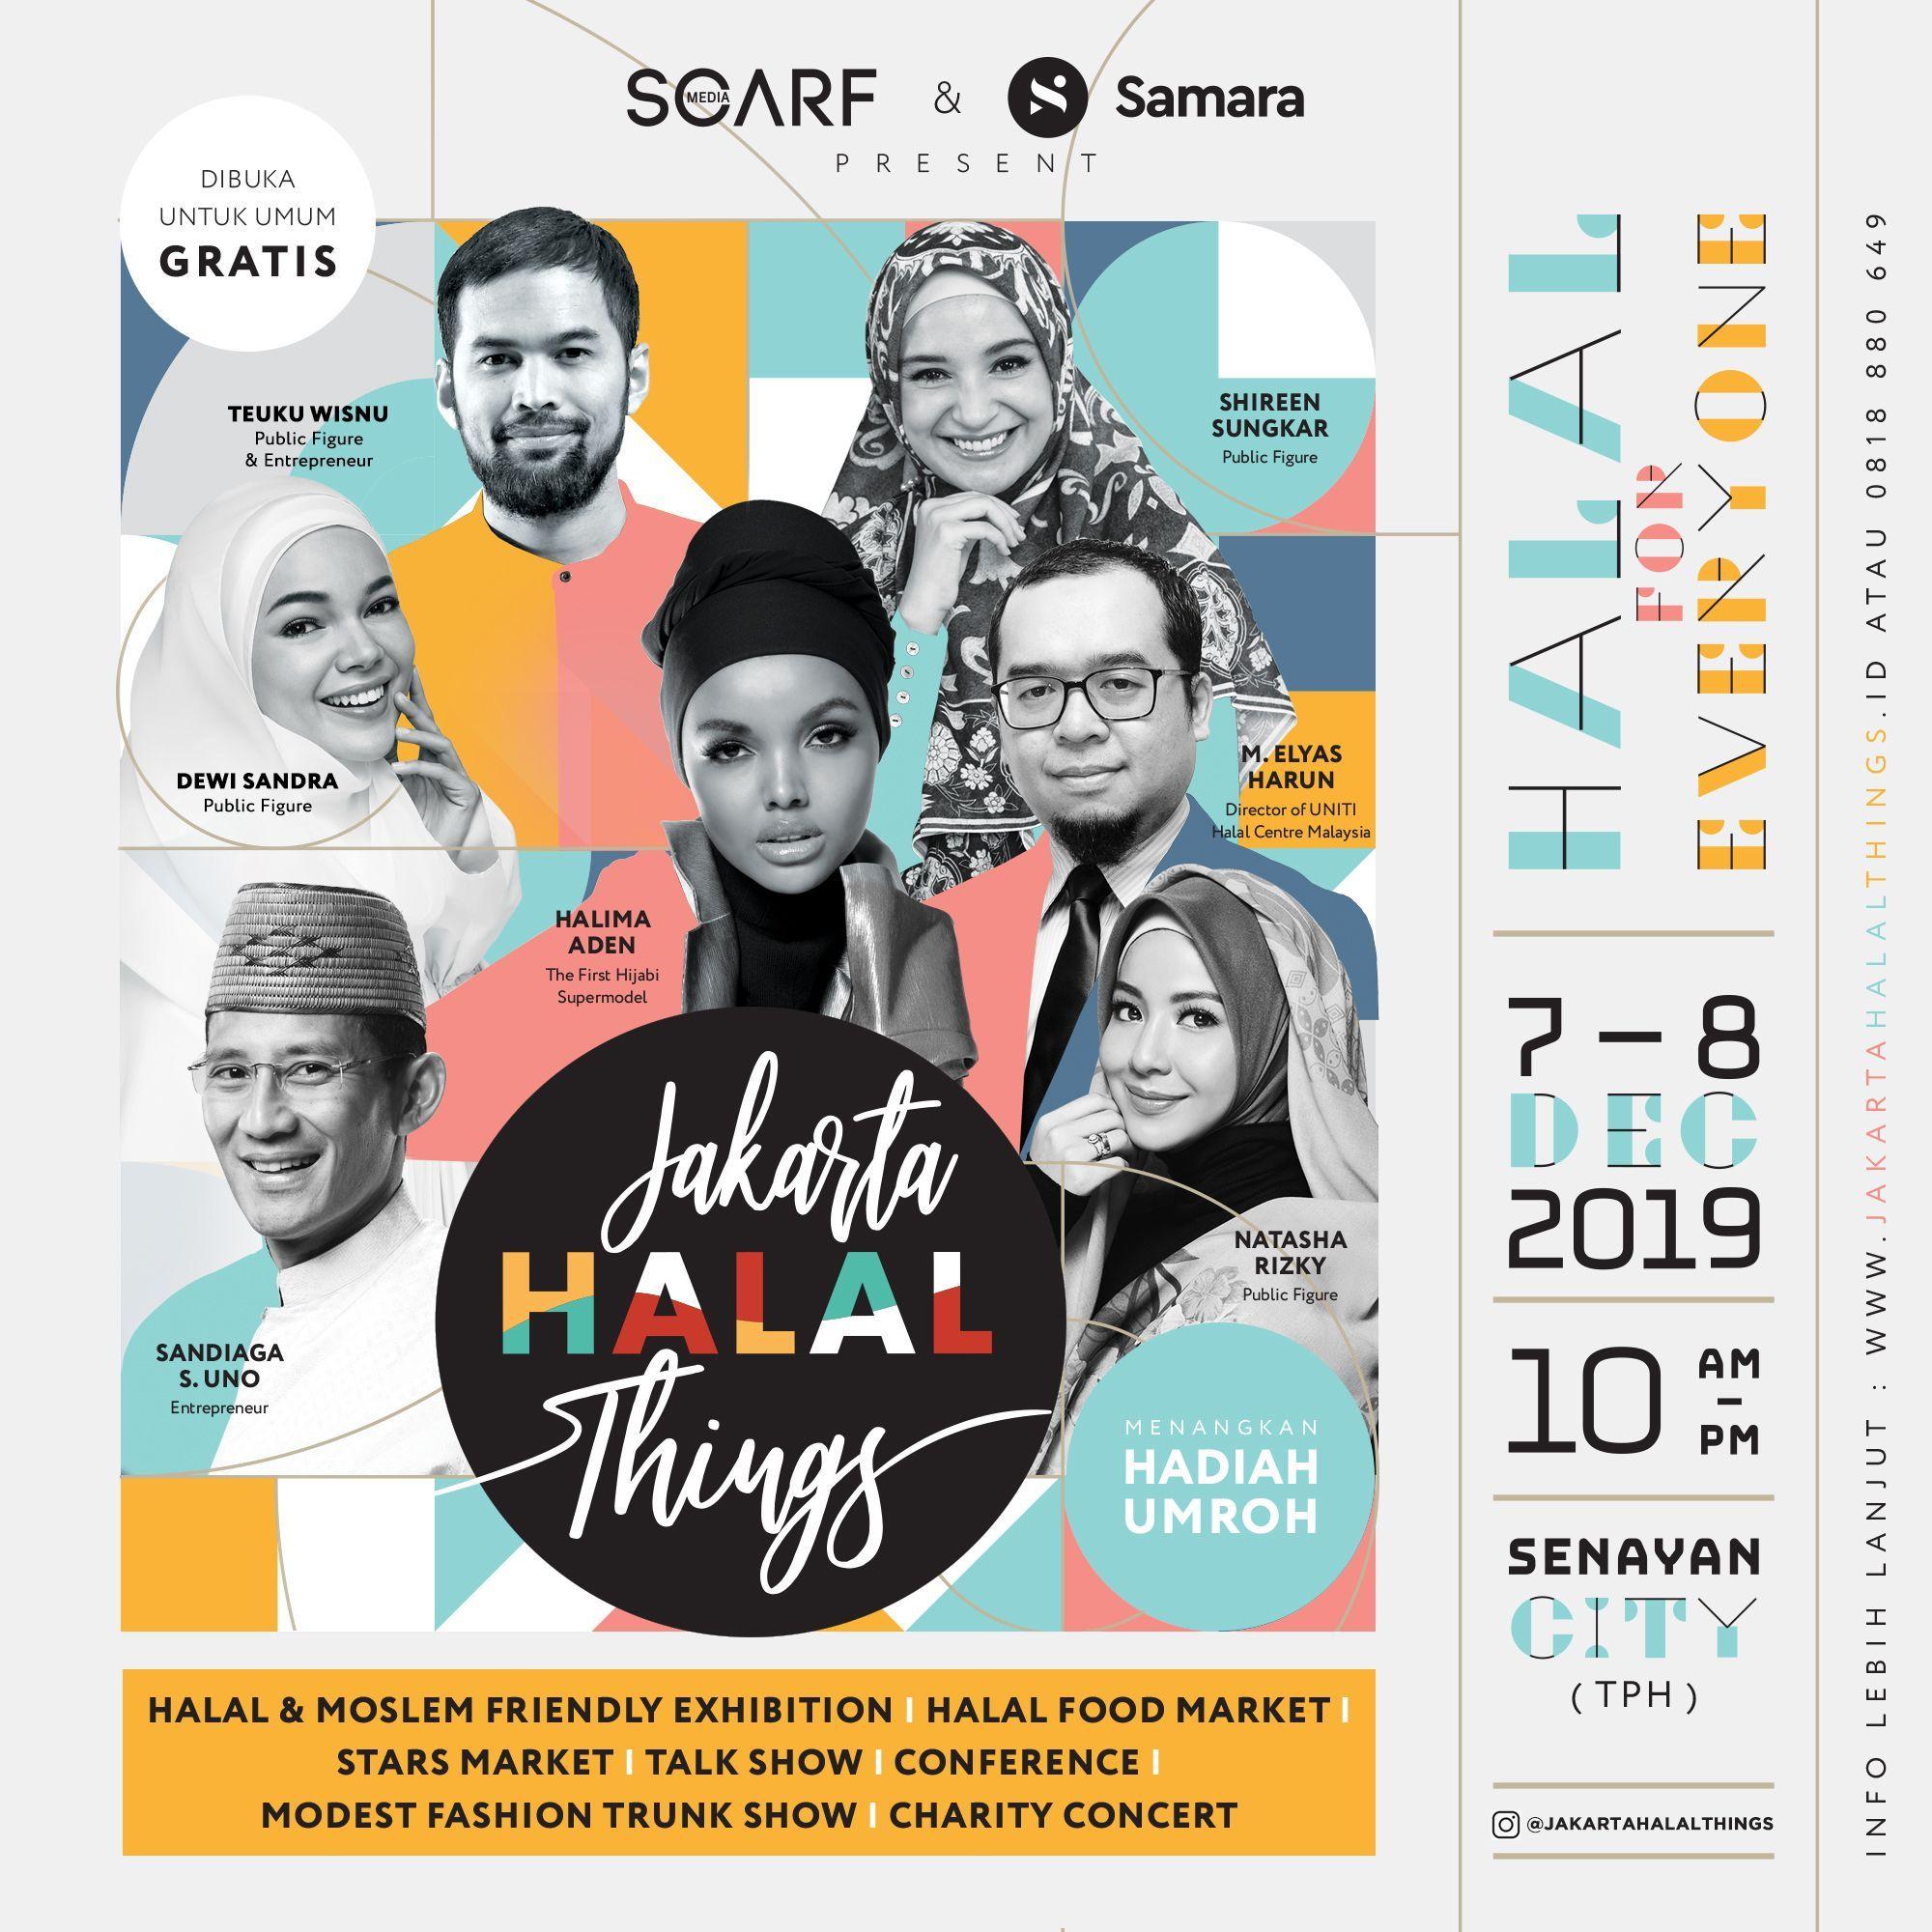 Jakarta Halal Things 2019, Membawa Gaya Hidup Halal untuk Semua